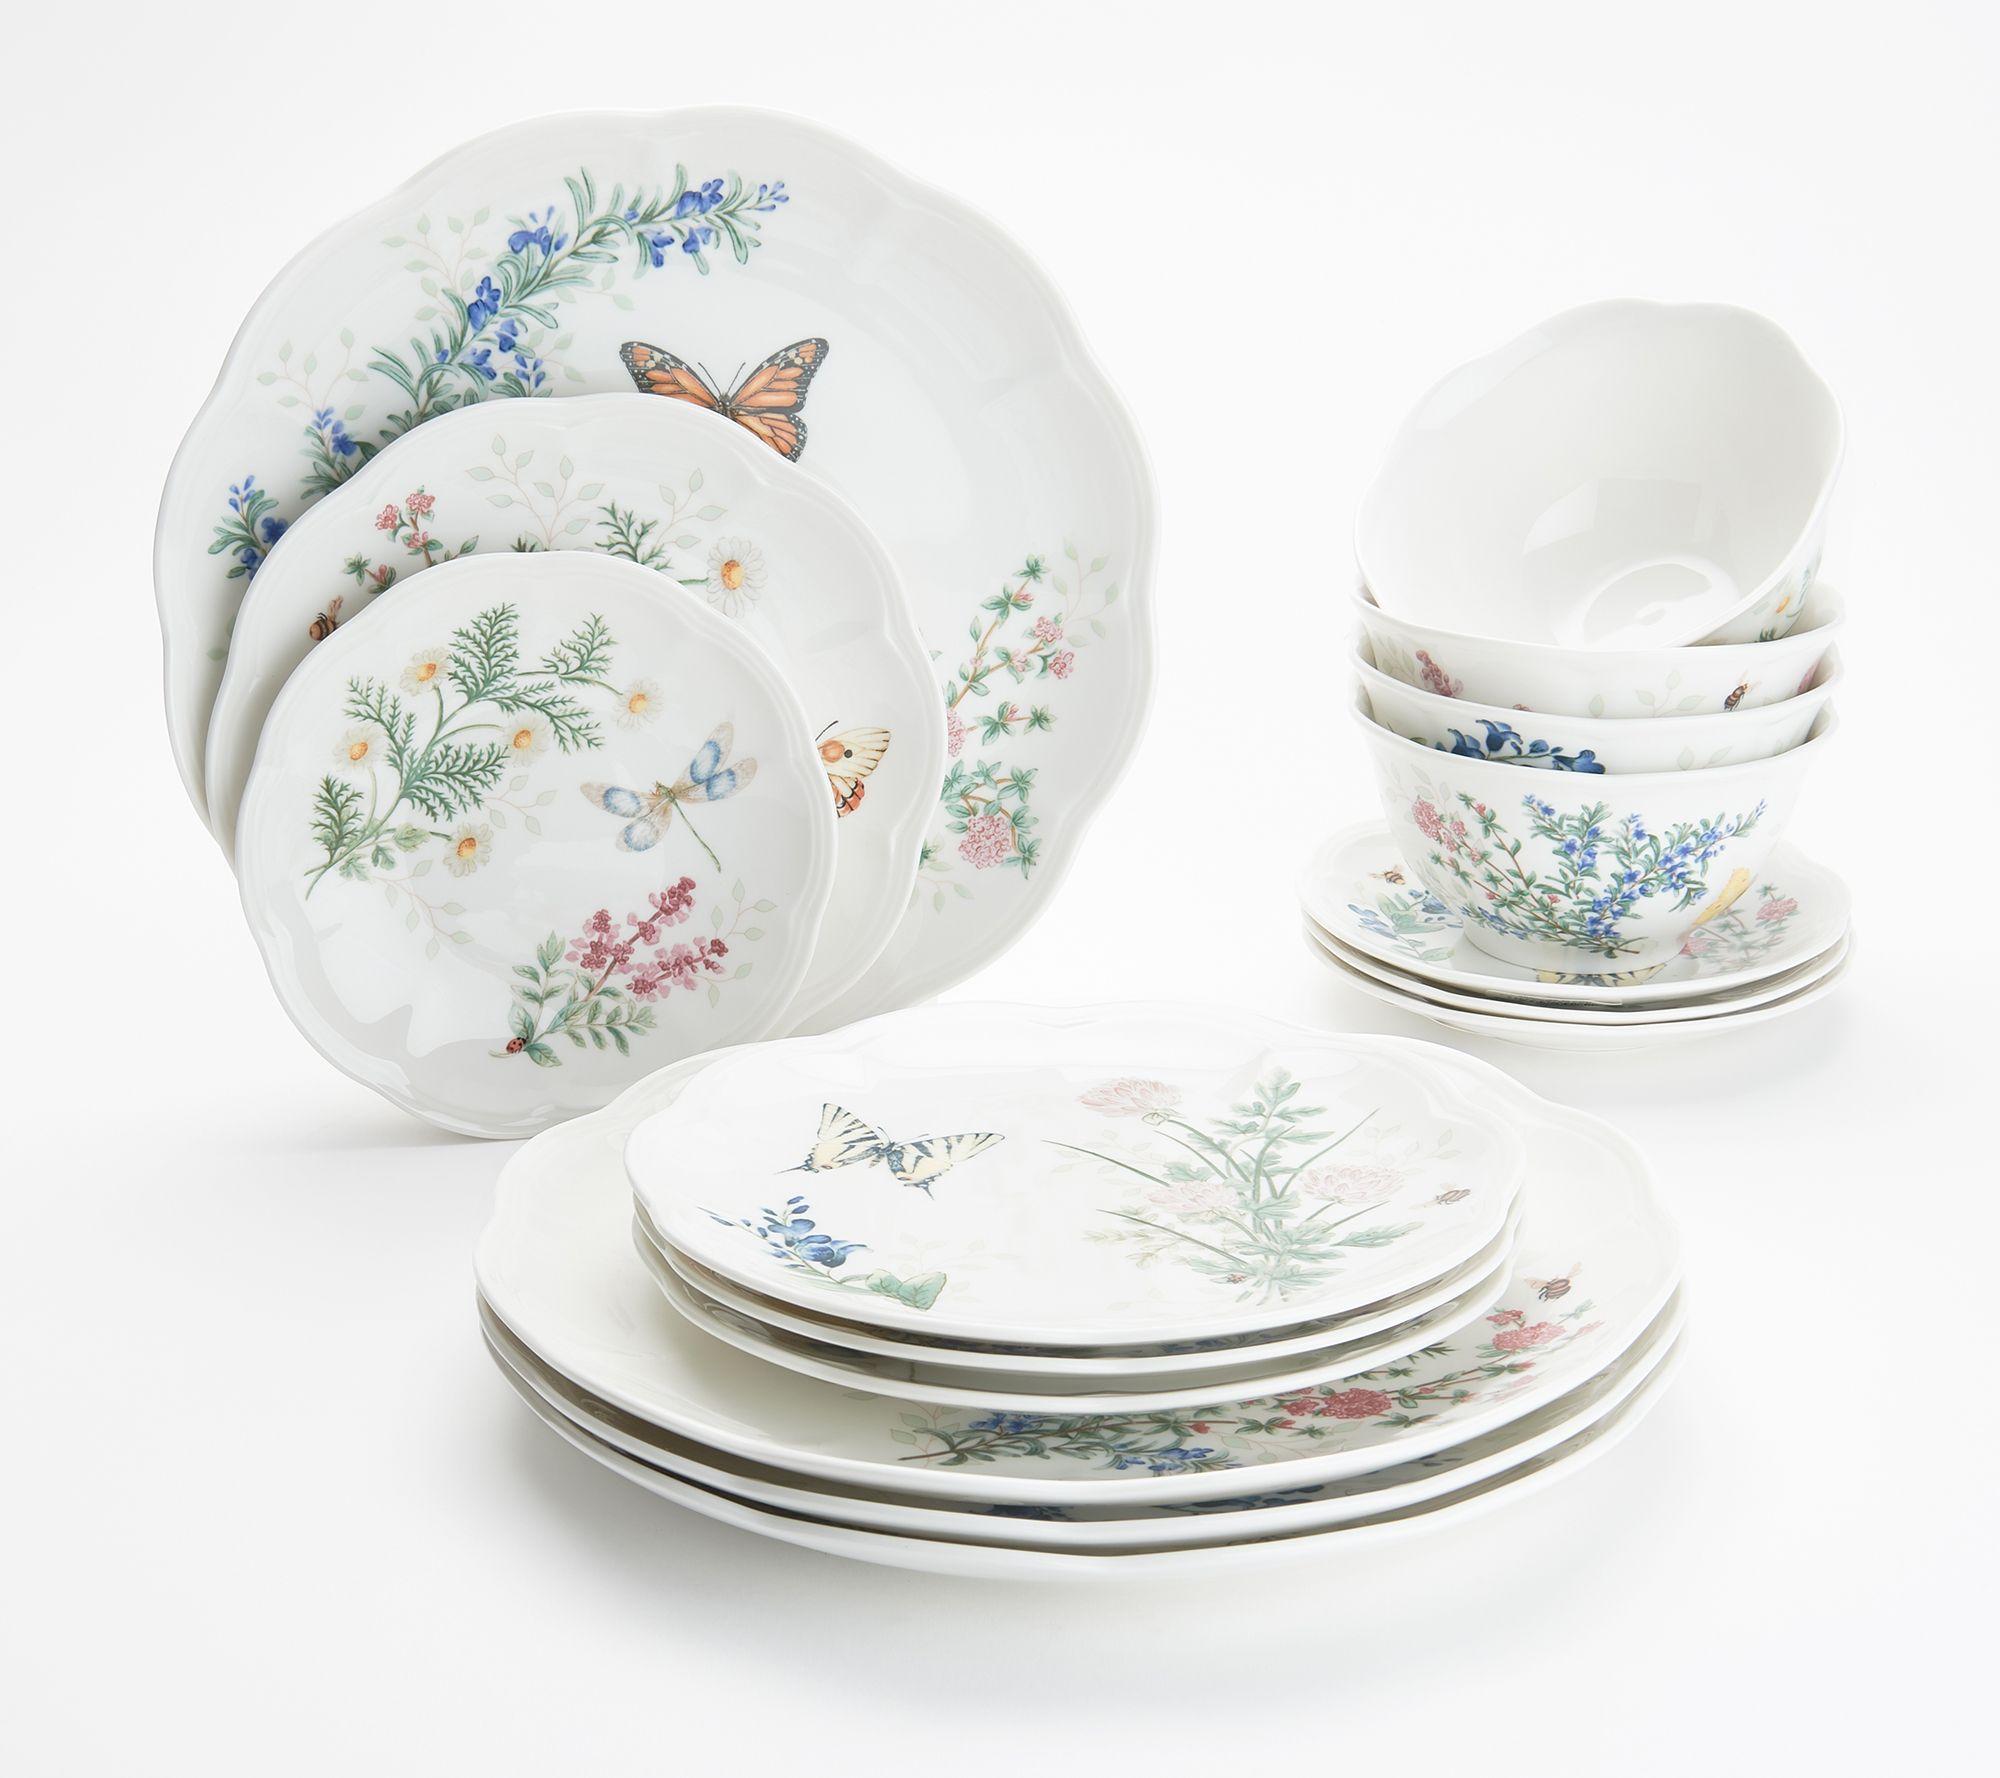 Lenox 16pc Porcelain Erfly Meadow Dinnerware Set Home